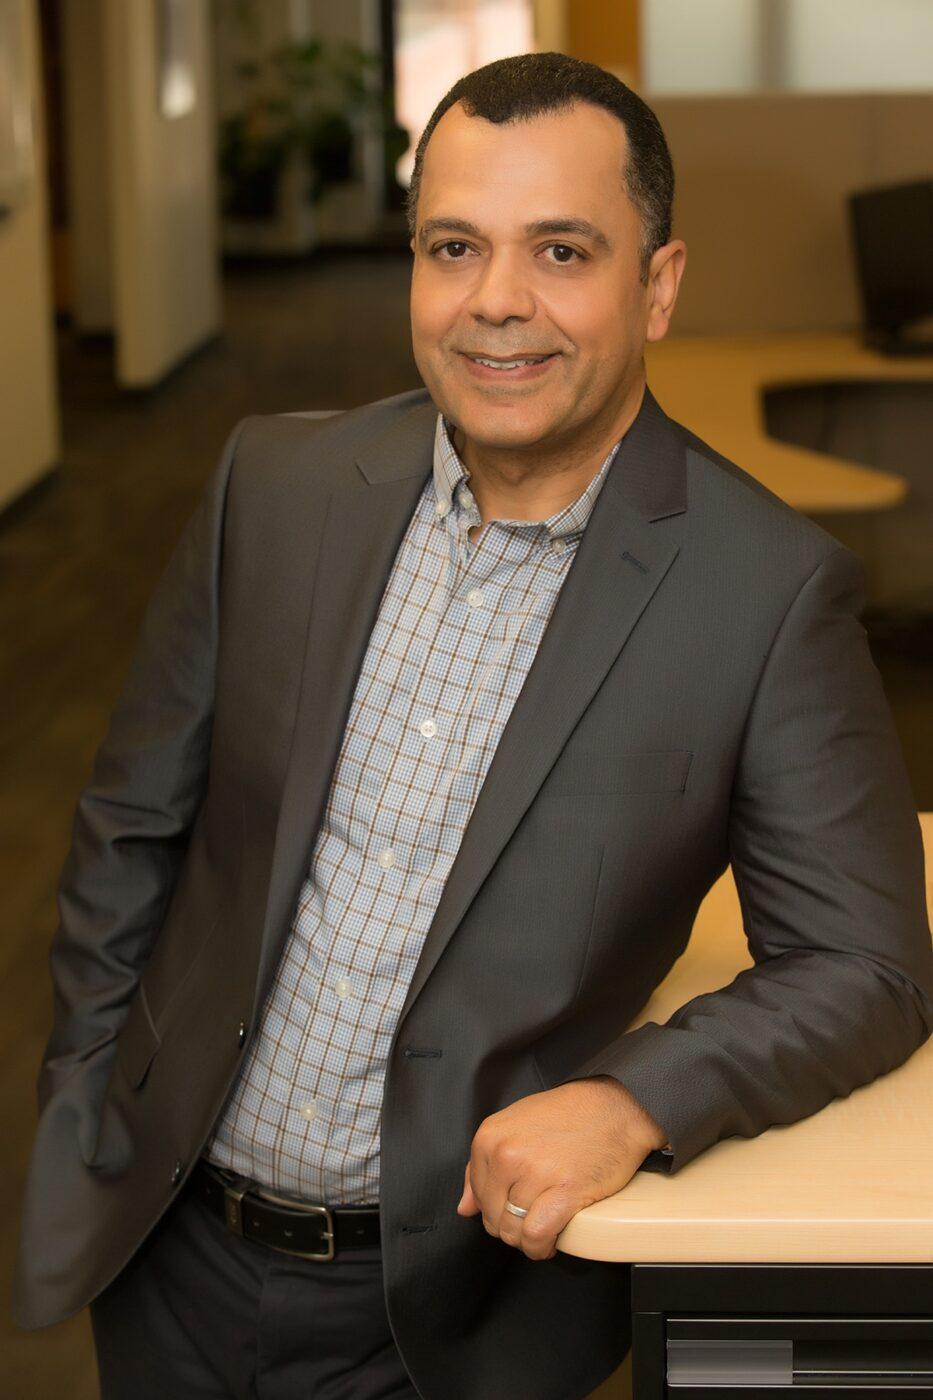 Mohamed Gamal,PhD- Subsidence Mitigation Leader ,3D Finite Element Modeling Subject Matter Expert,Brierley Associates Corp